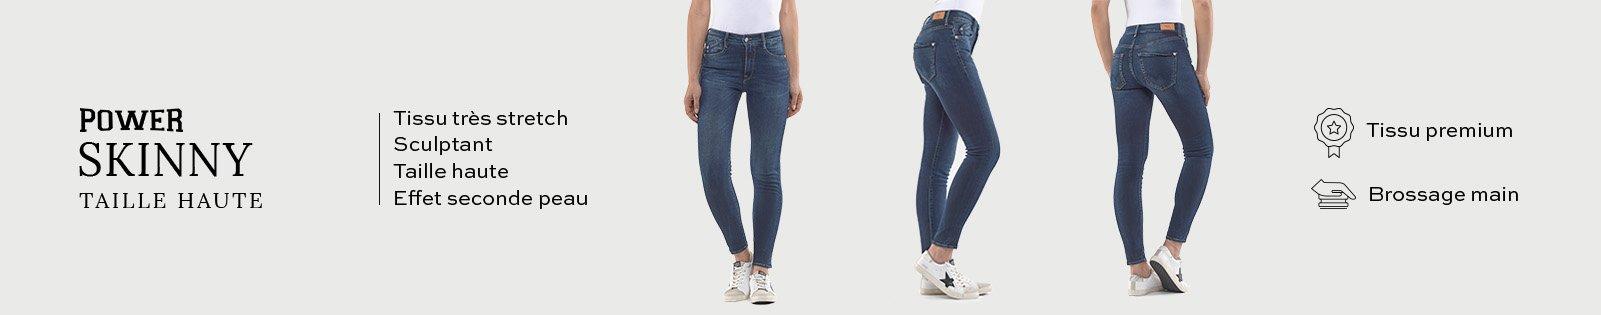 Power Skinny Taille Haute